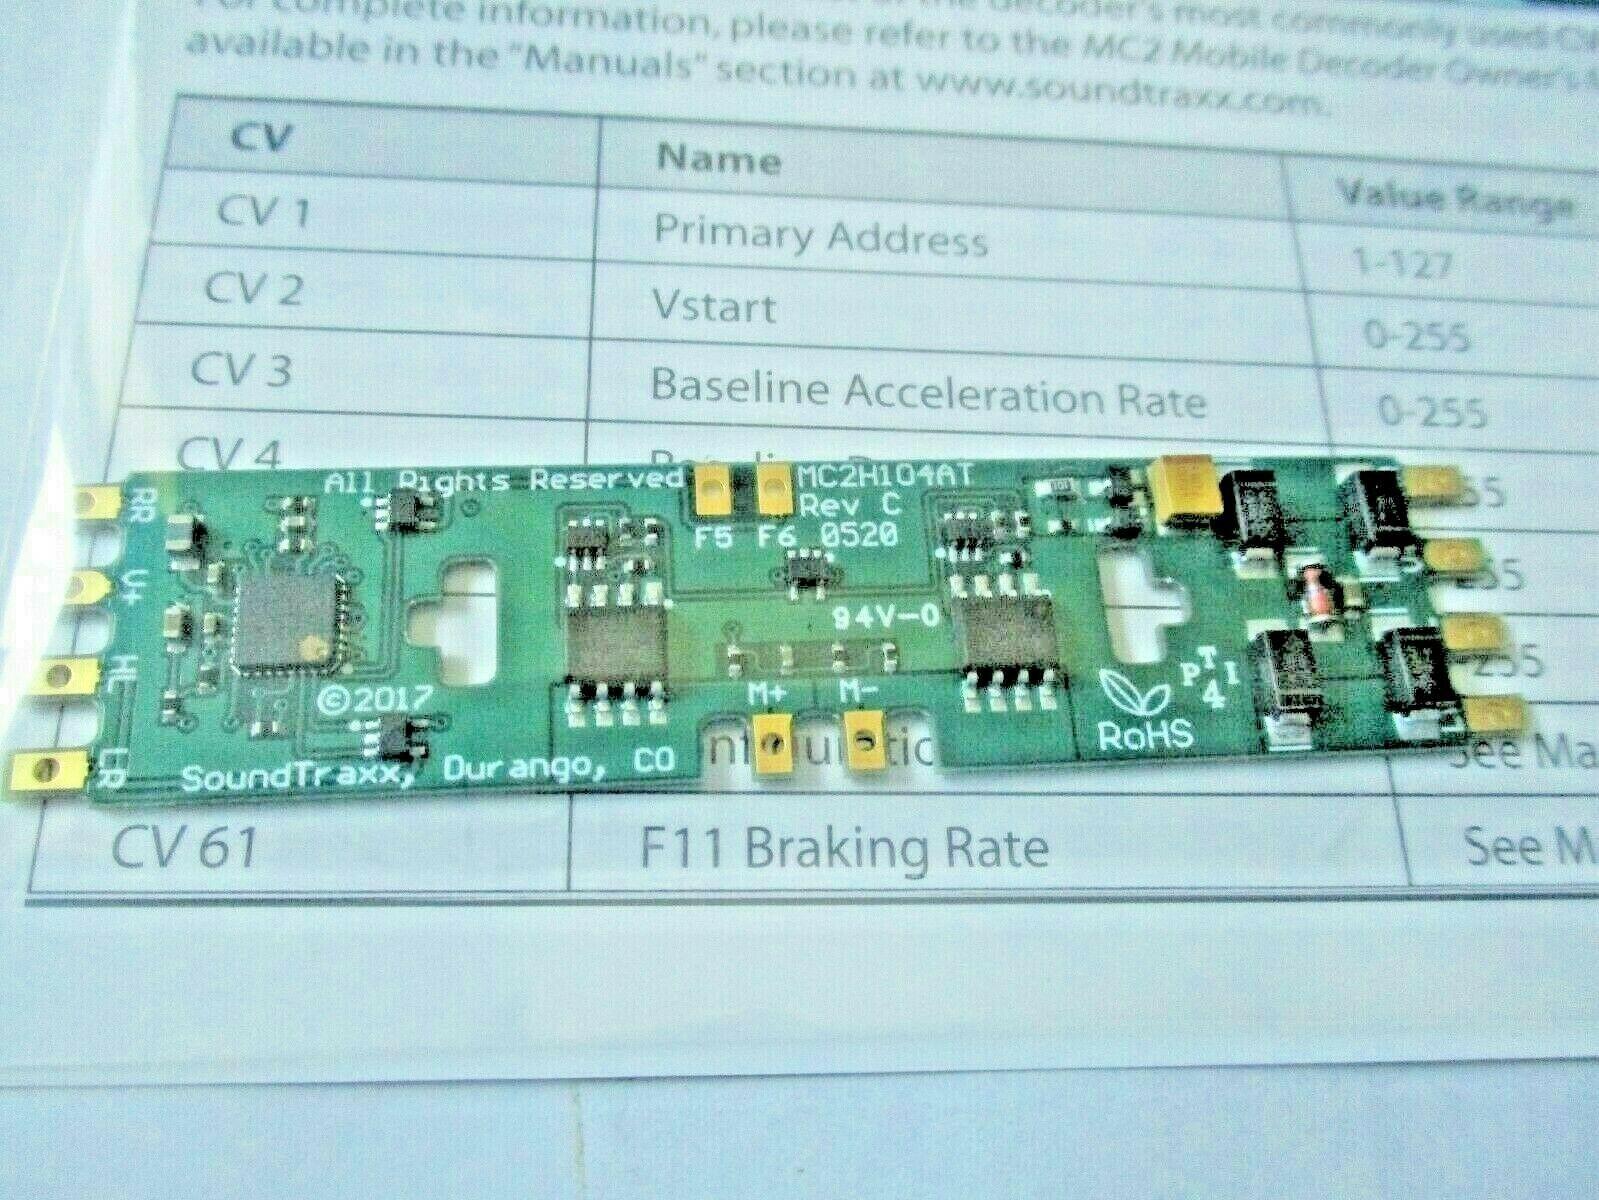 Soundtraxx 852002 MC2H104AT DCC Mobile Decoder 4 Function Atlas, Ath, Kato Style